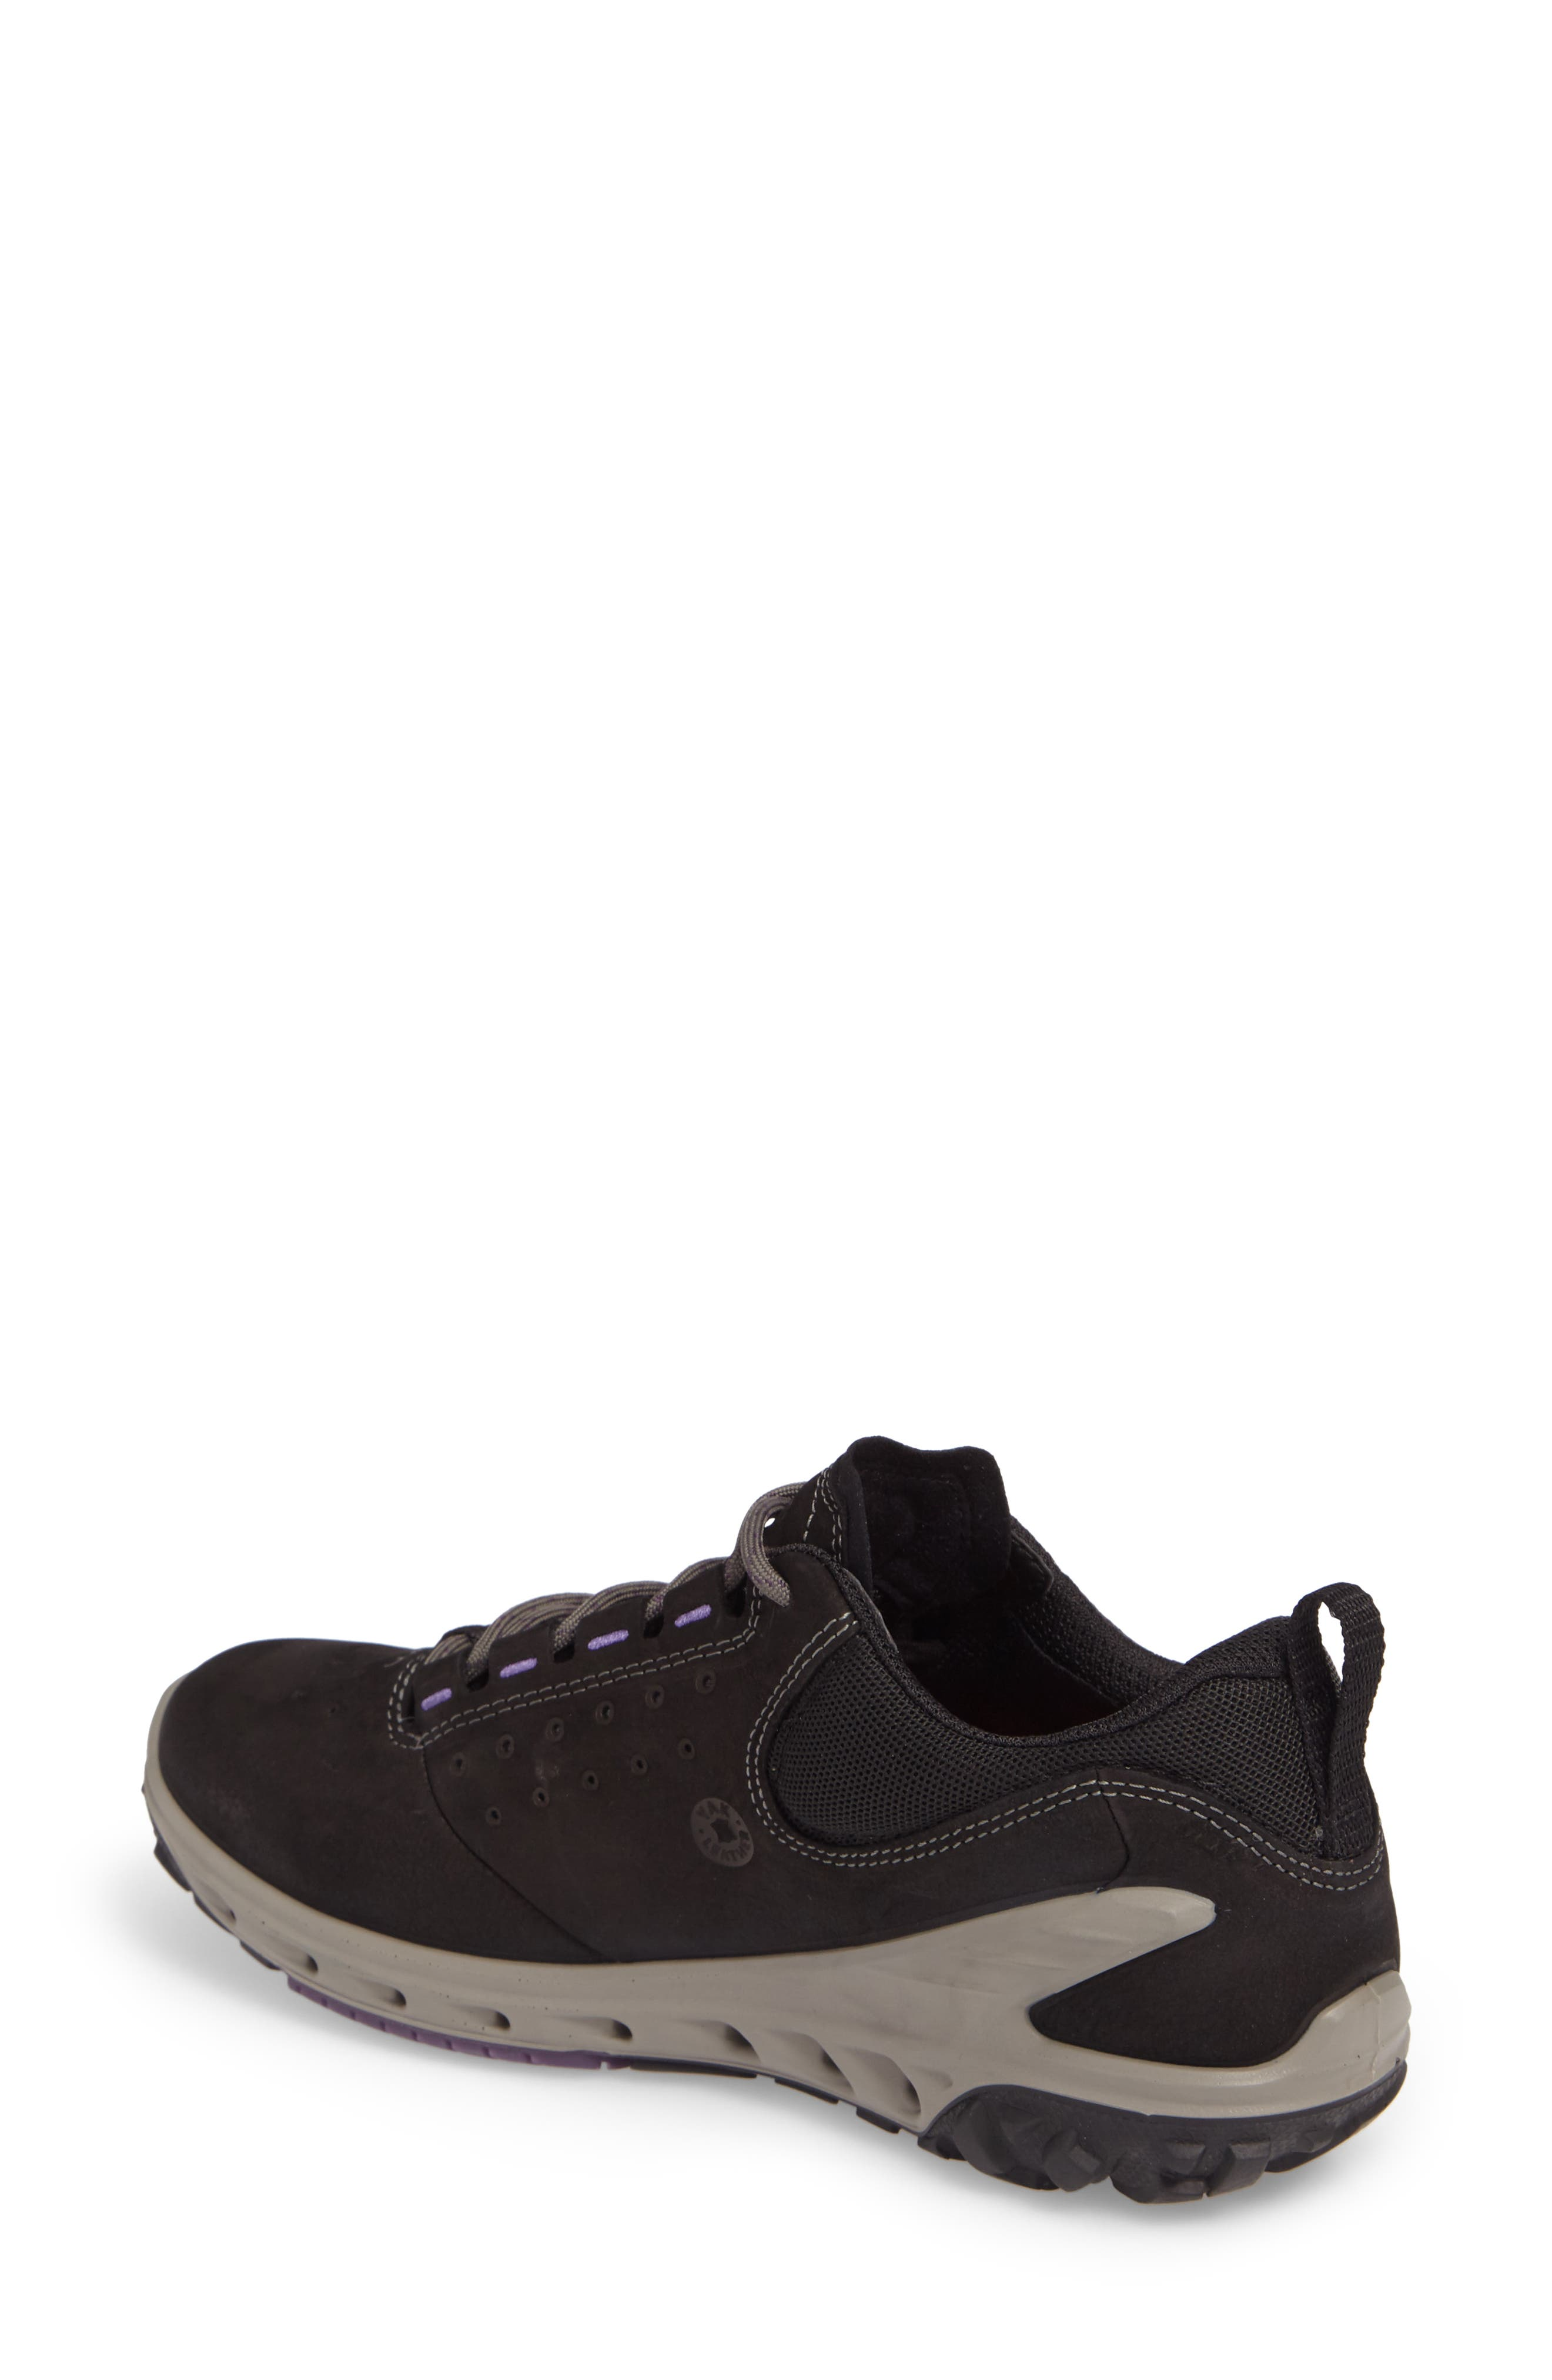 BIOM Venture GTX Sneaker,                             Alternate thumbnail 2, color,                             BLACK LEATHER